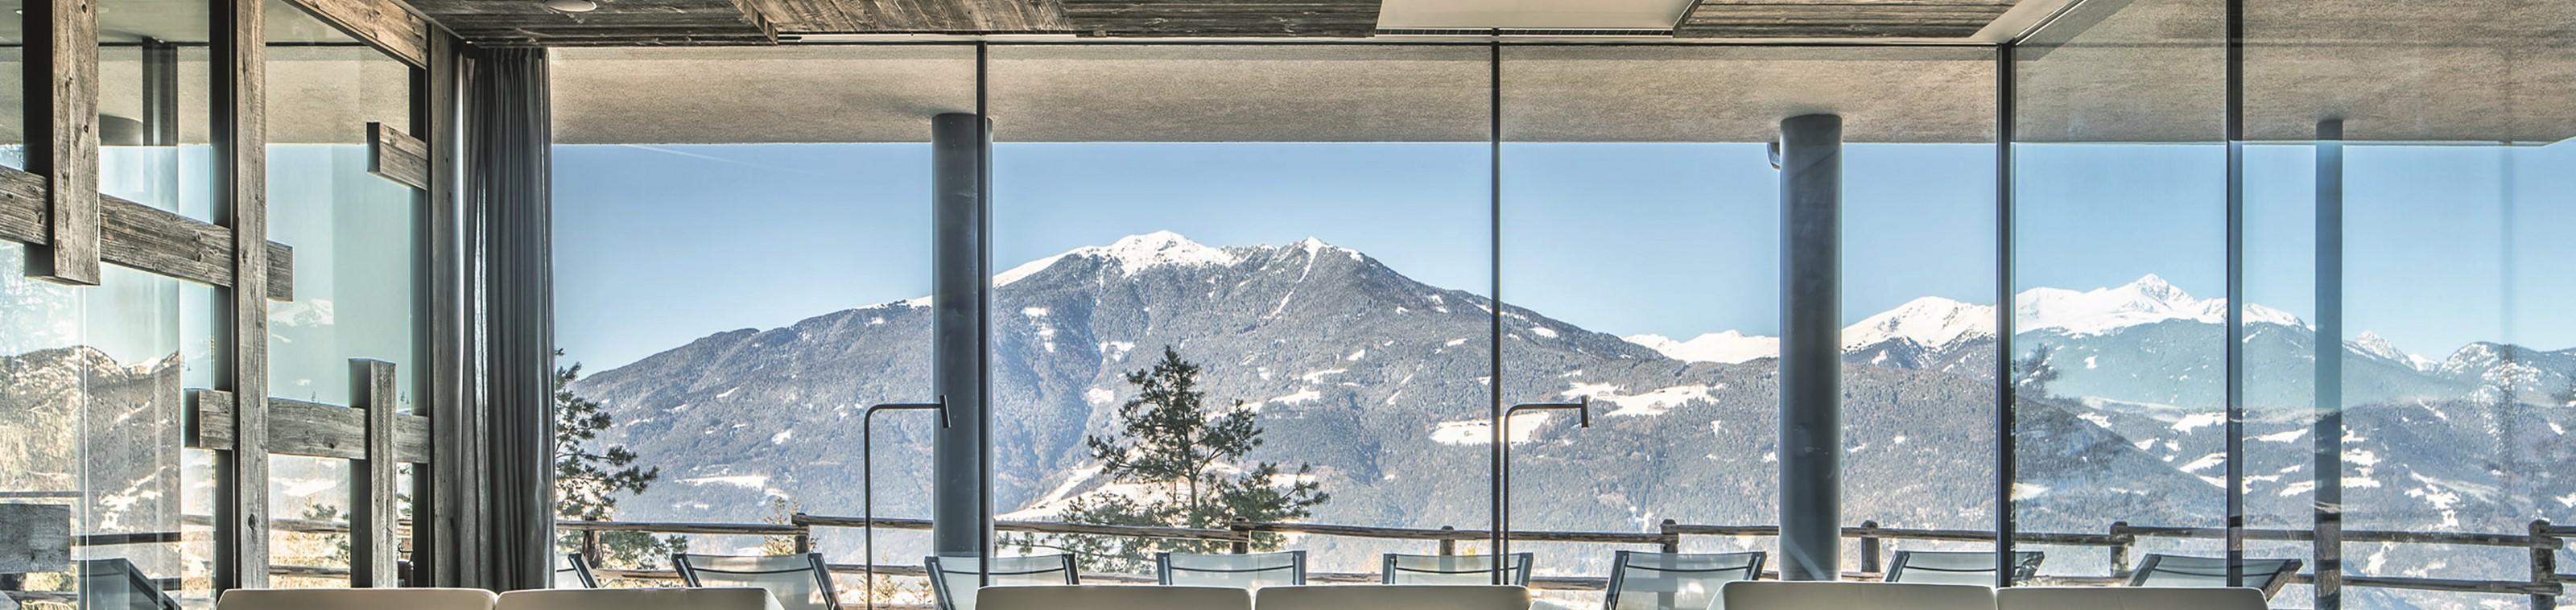 Wintervakantie in luxe boetiekhotel: TUI BLUE My Arbor****sup